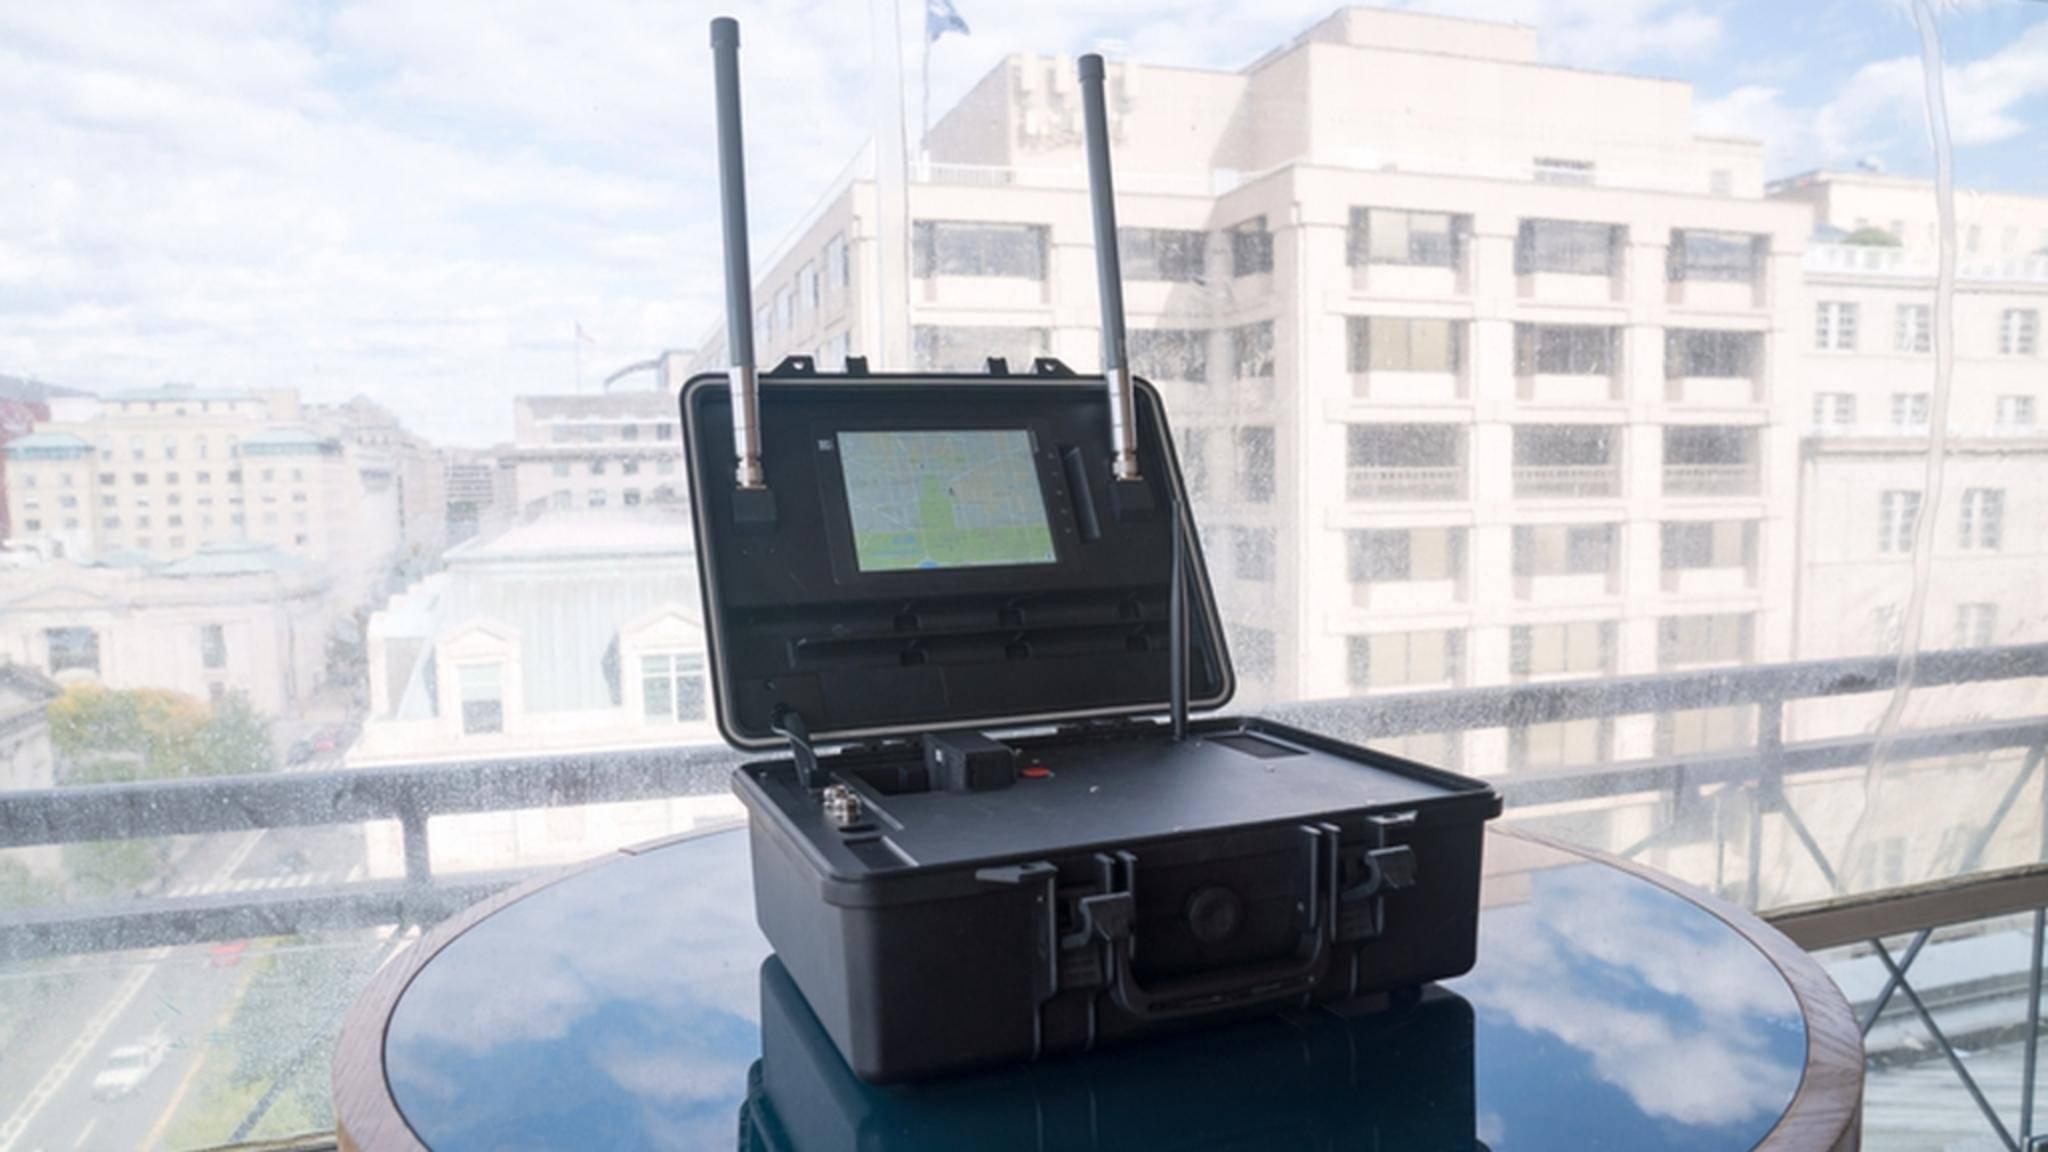 Der AeroScope kann DJI-Drohnen tracken.